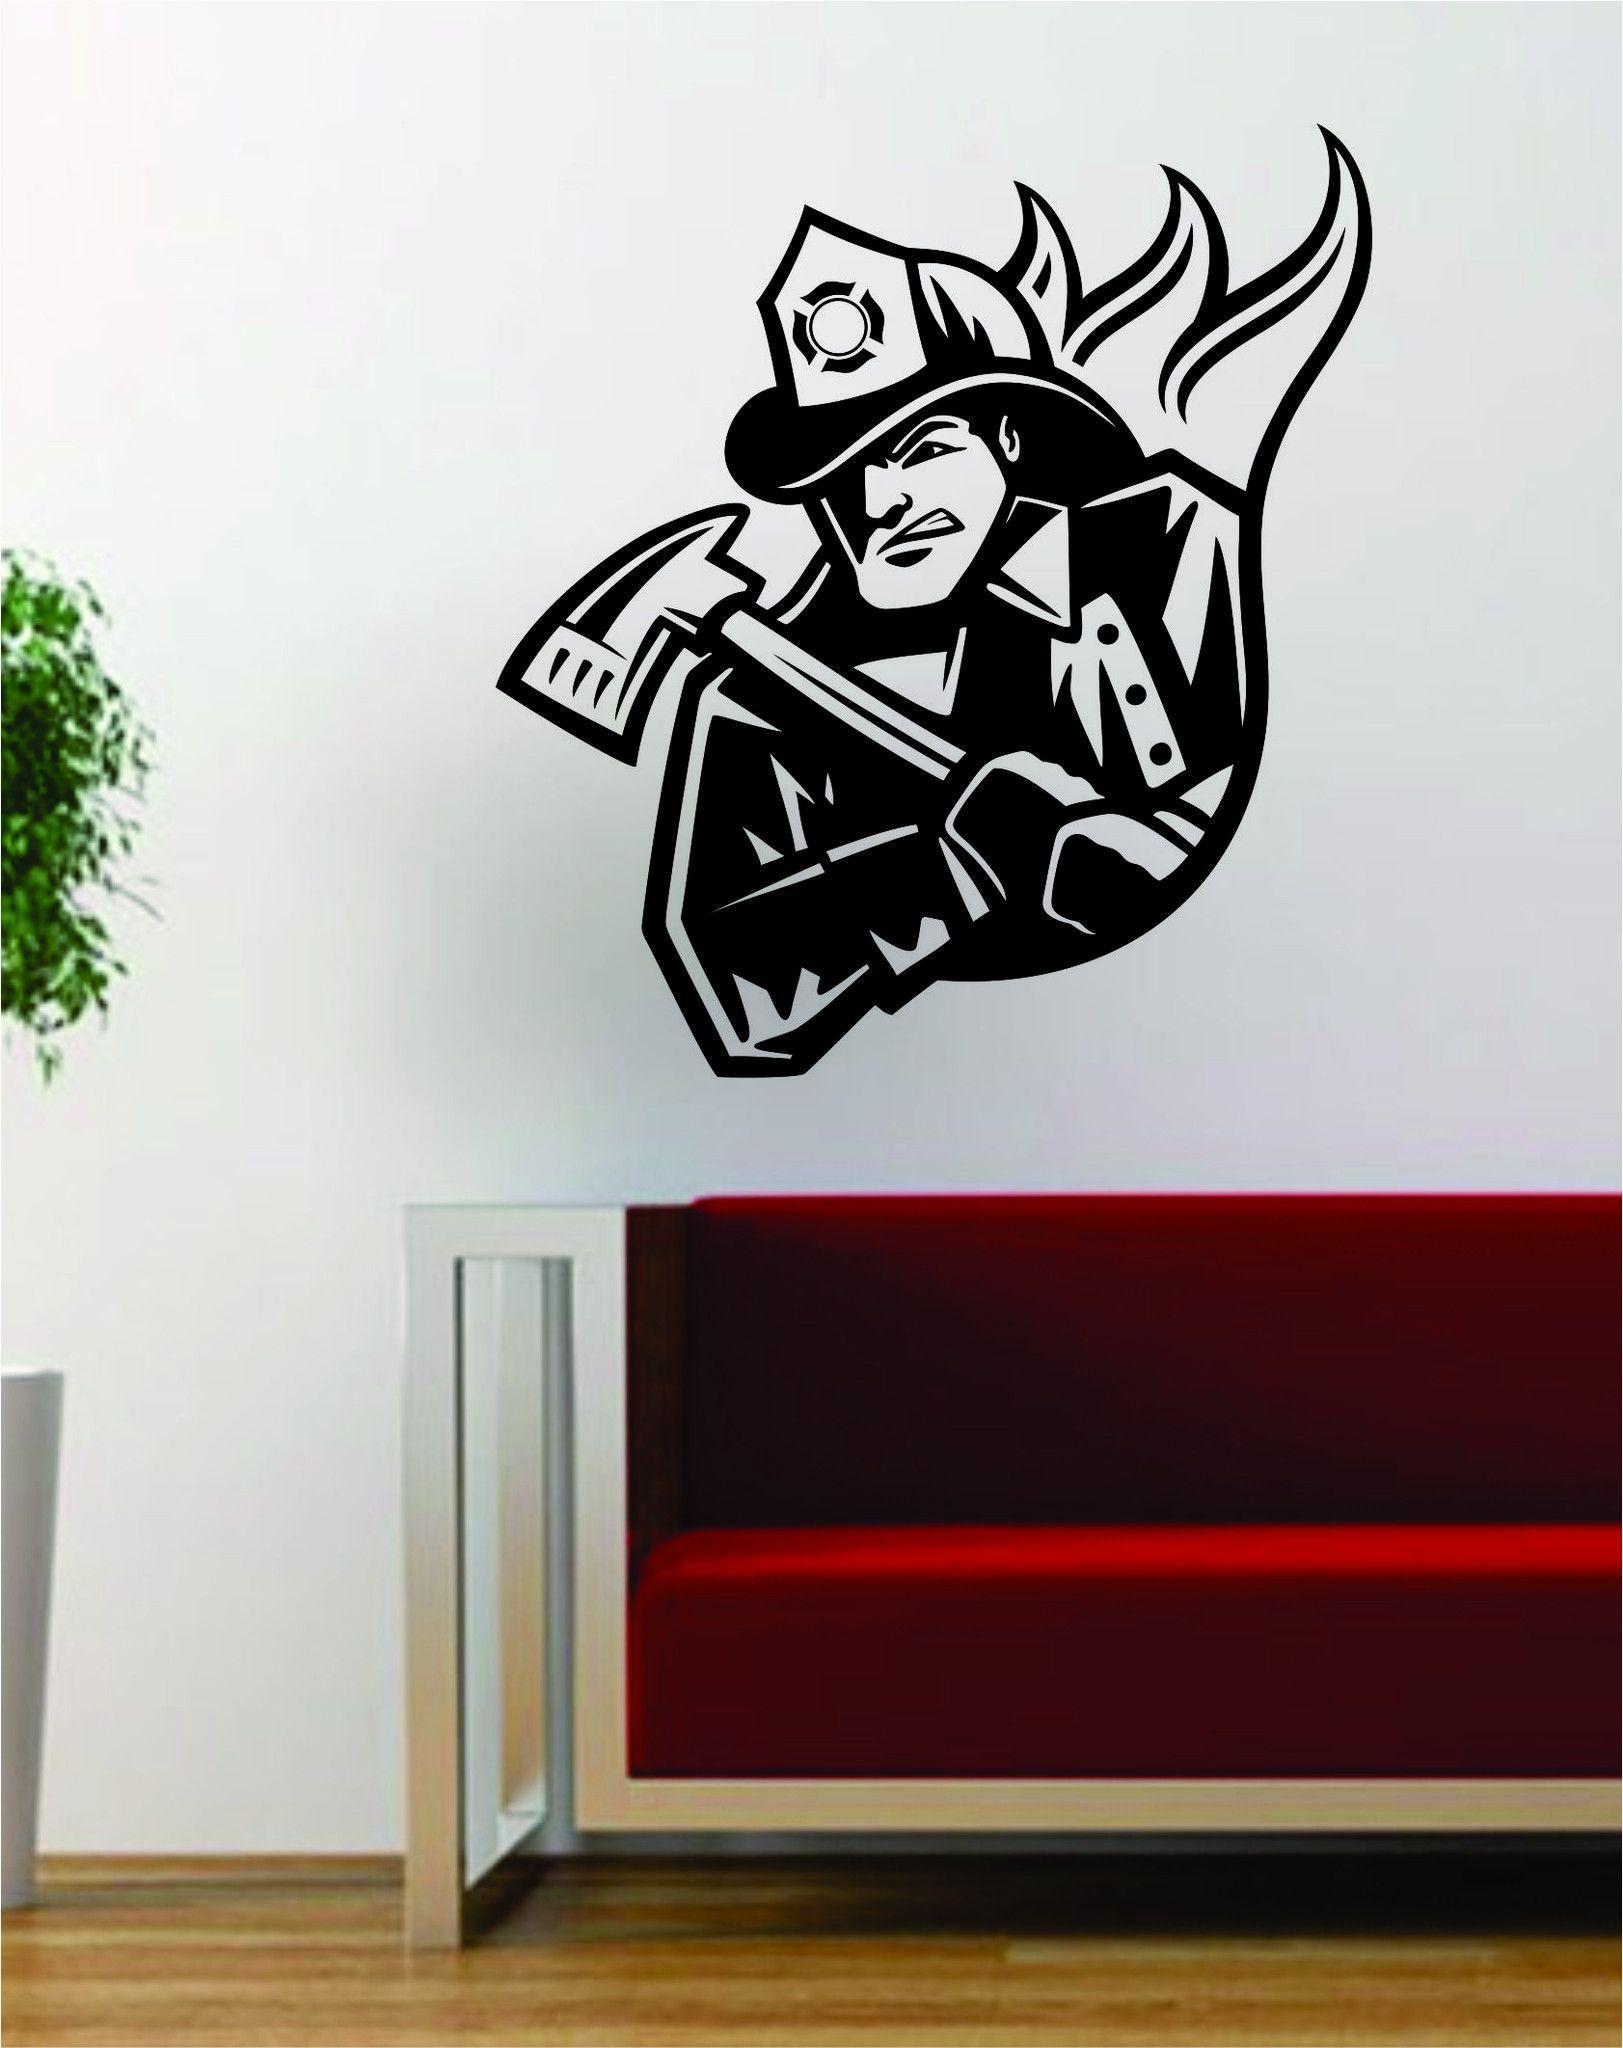 Fireman Firefighter Silhouette Vinyl Wall Words Decal Sticker Graphic